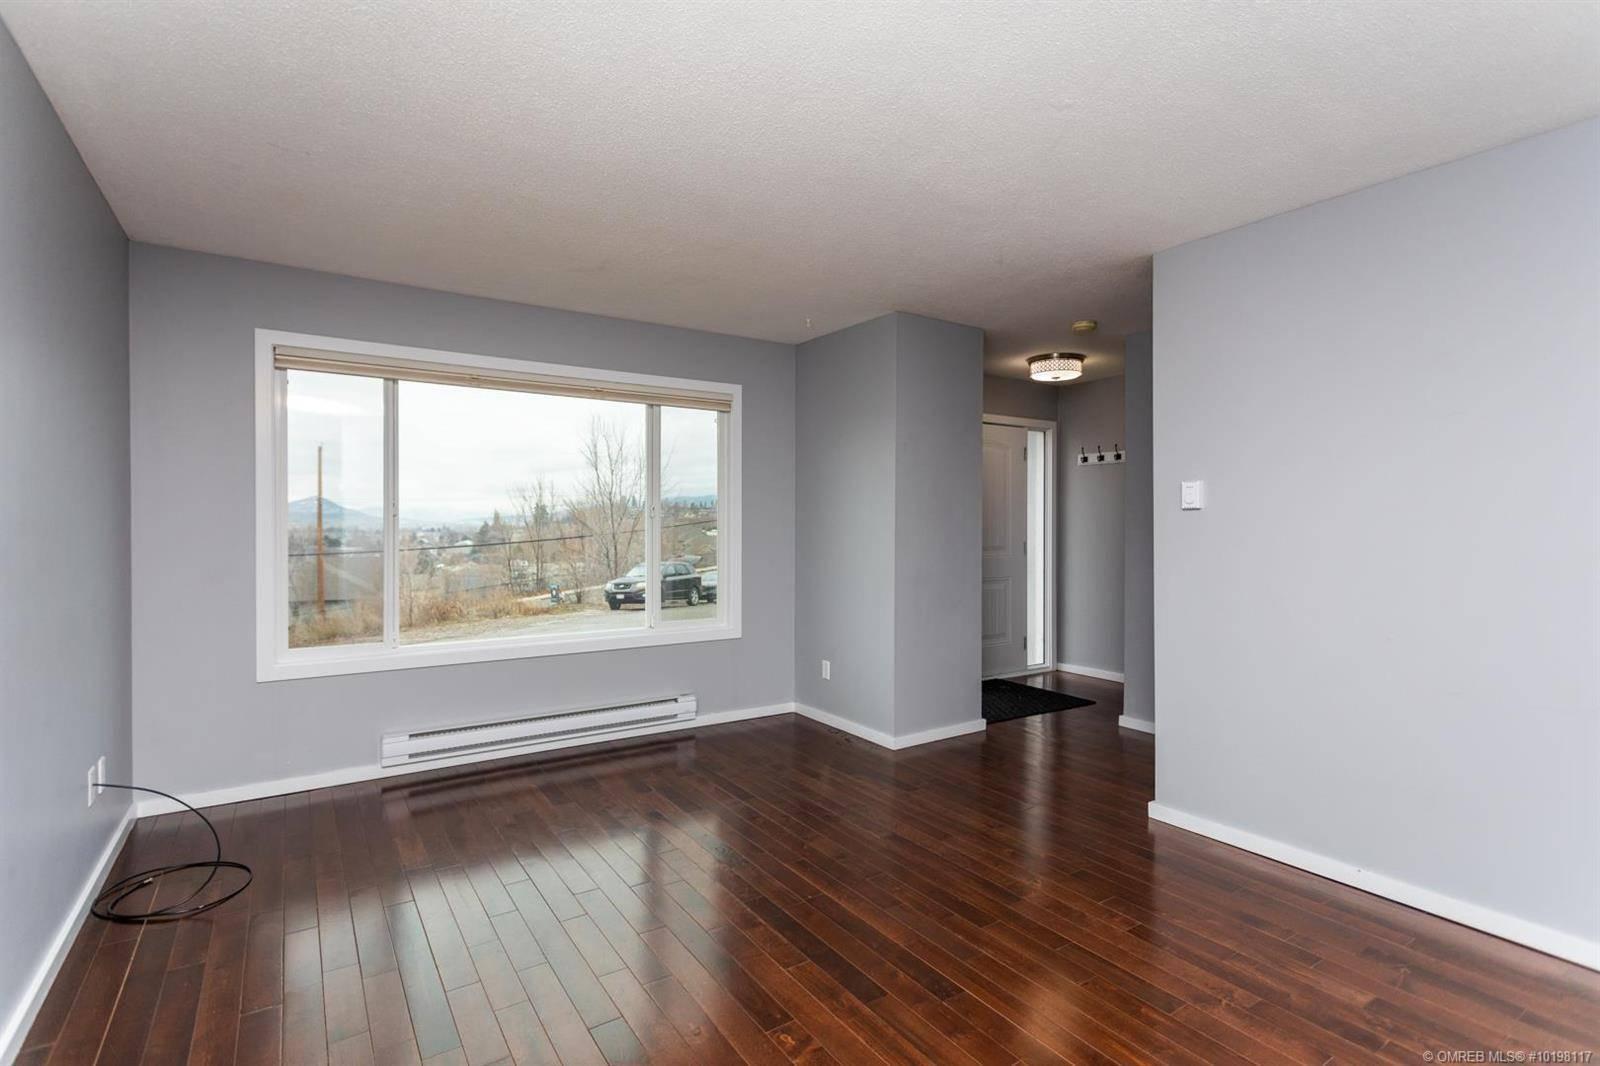 Townhouse for sale at 745 Mckenzie Rd Unit 1 Kelowna British Columbia - MLS: 10198117